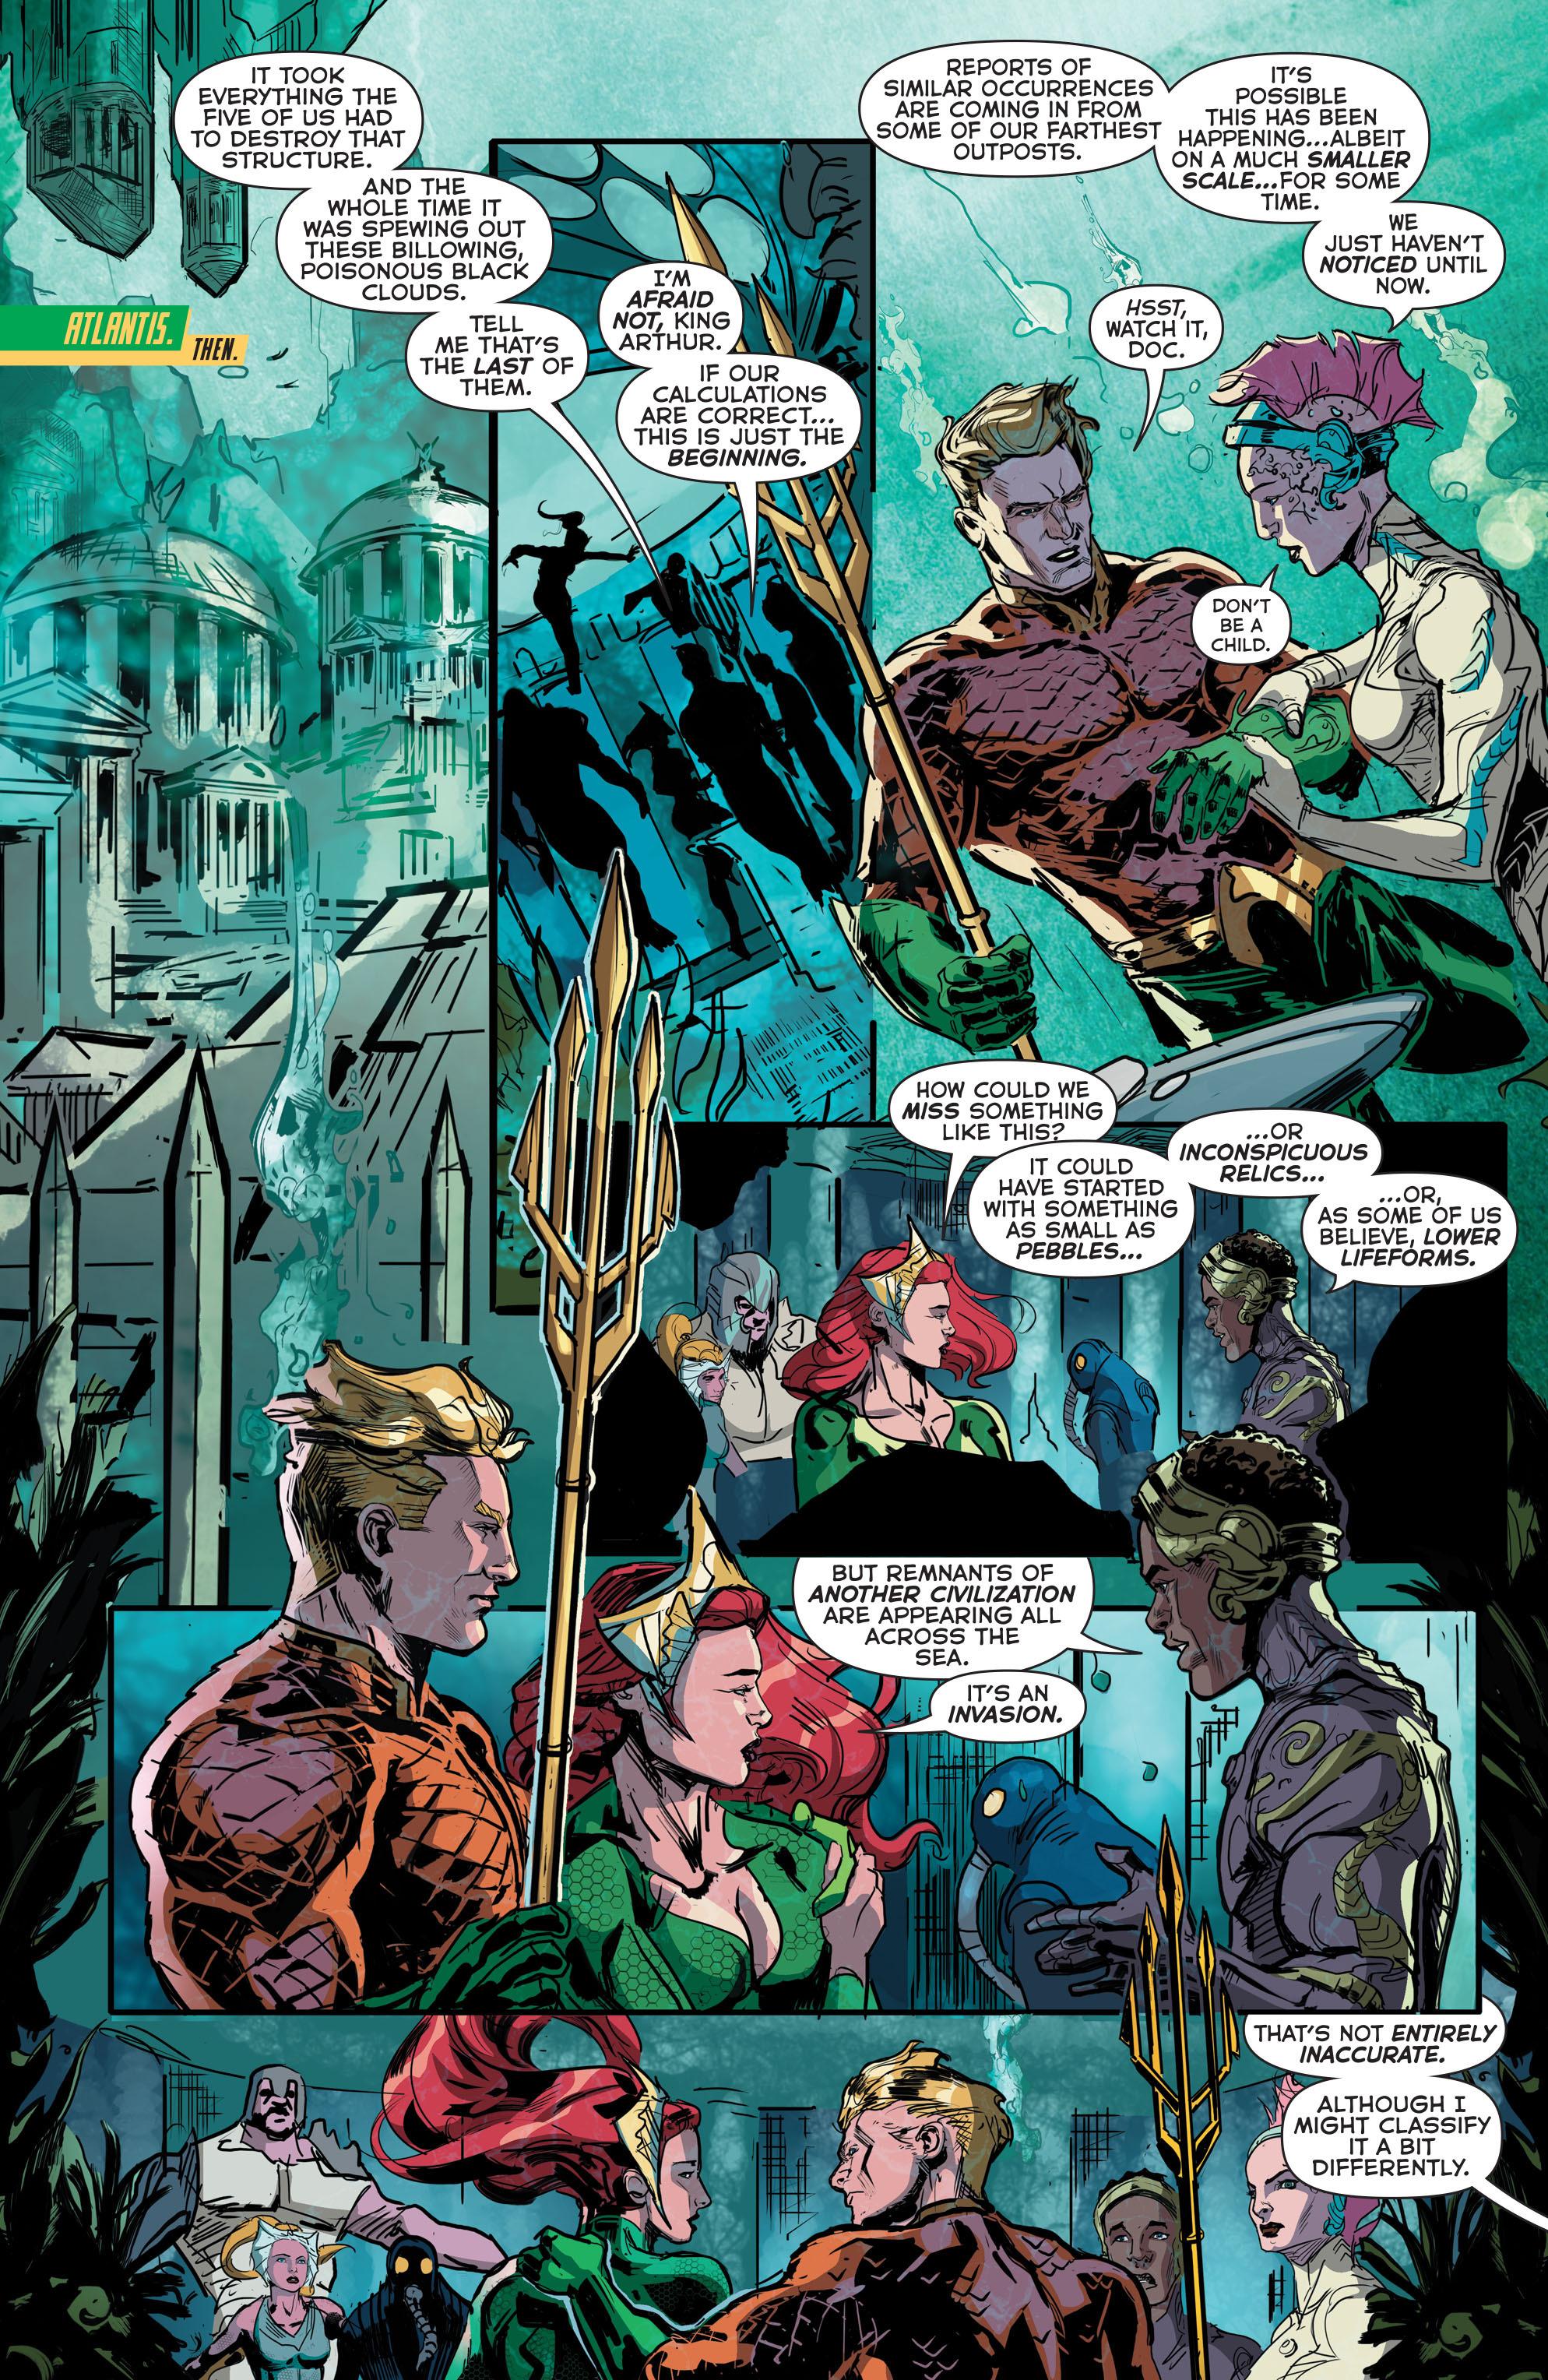 Read online Aquaman (2011) comic -  Issue #41 - 15